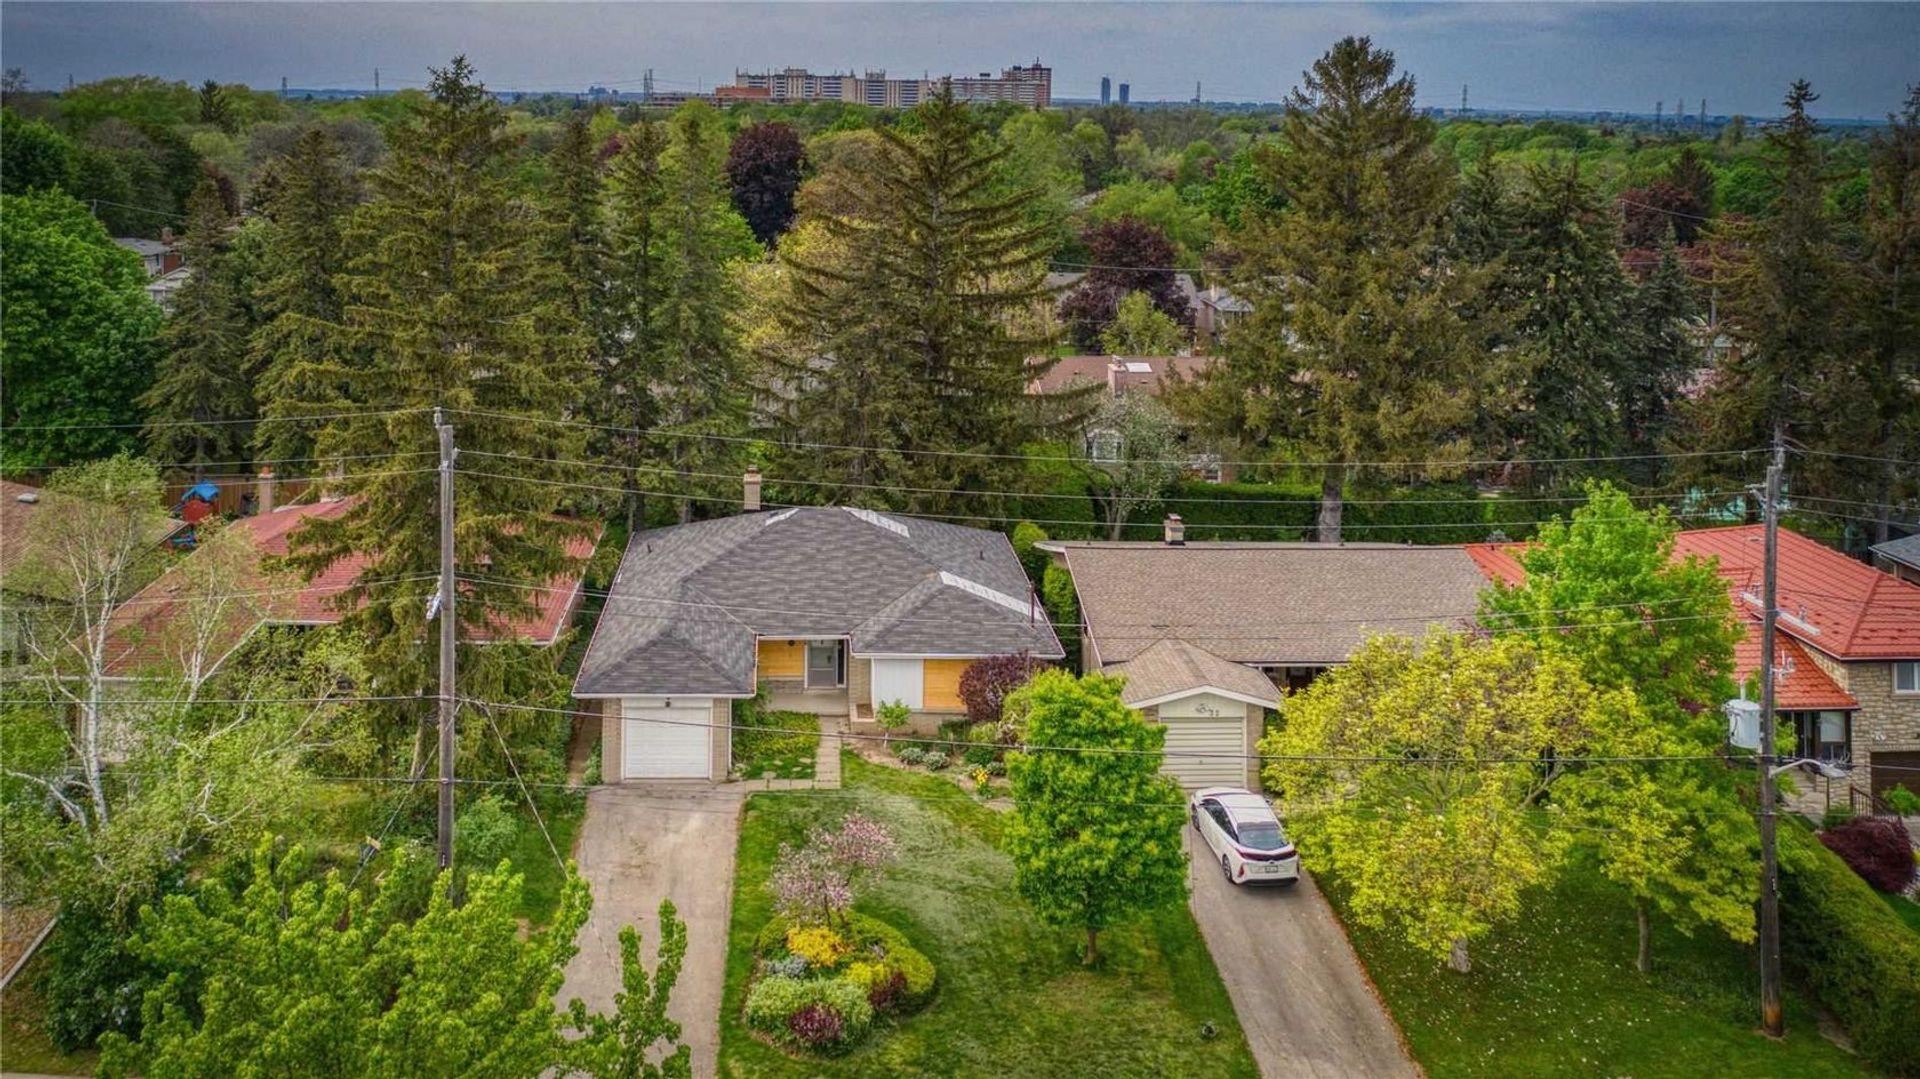 30-blithfield-ave-bayview-village-toronto-02 at 30 Blithfield Avenue, Bayview Village, Toronto